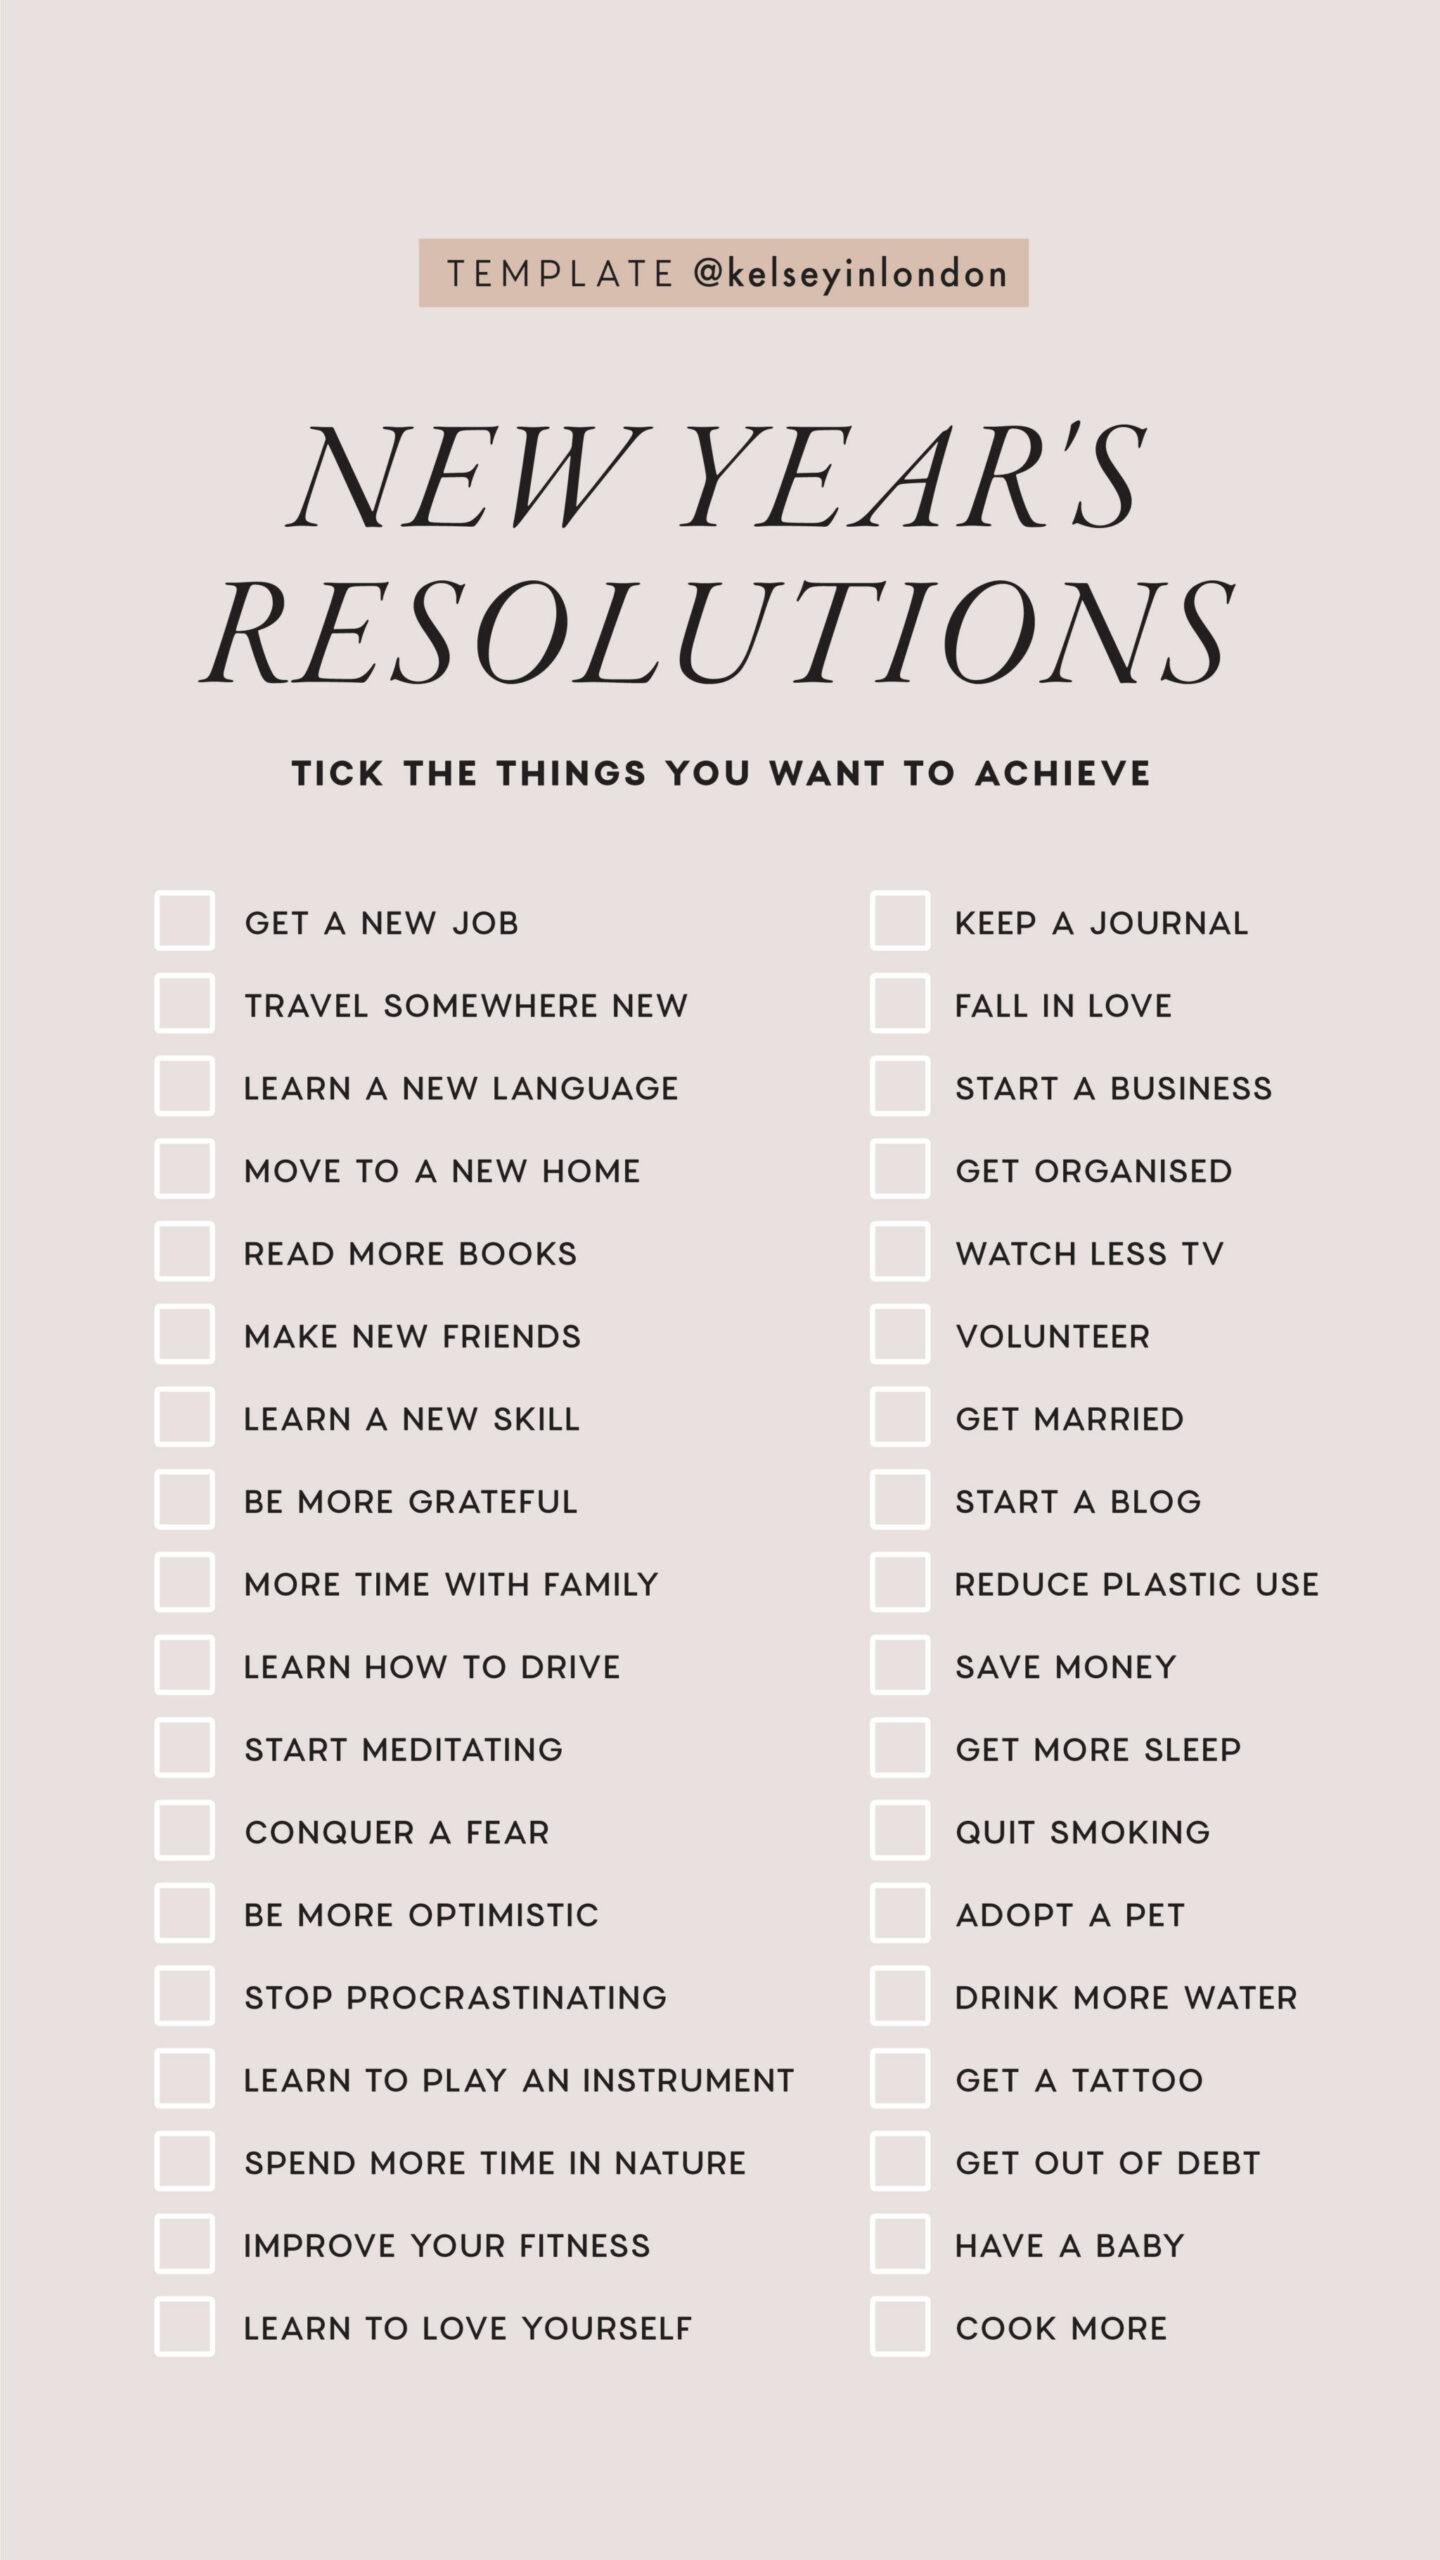 Instagram Story Template - kelseyinlondon - Kelsey Heinrichs - New Year Resolution Ideas - New Year Bucketlist